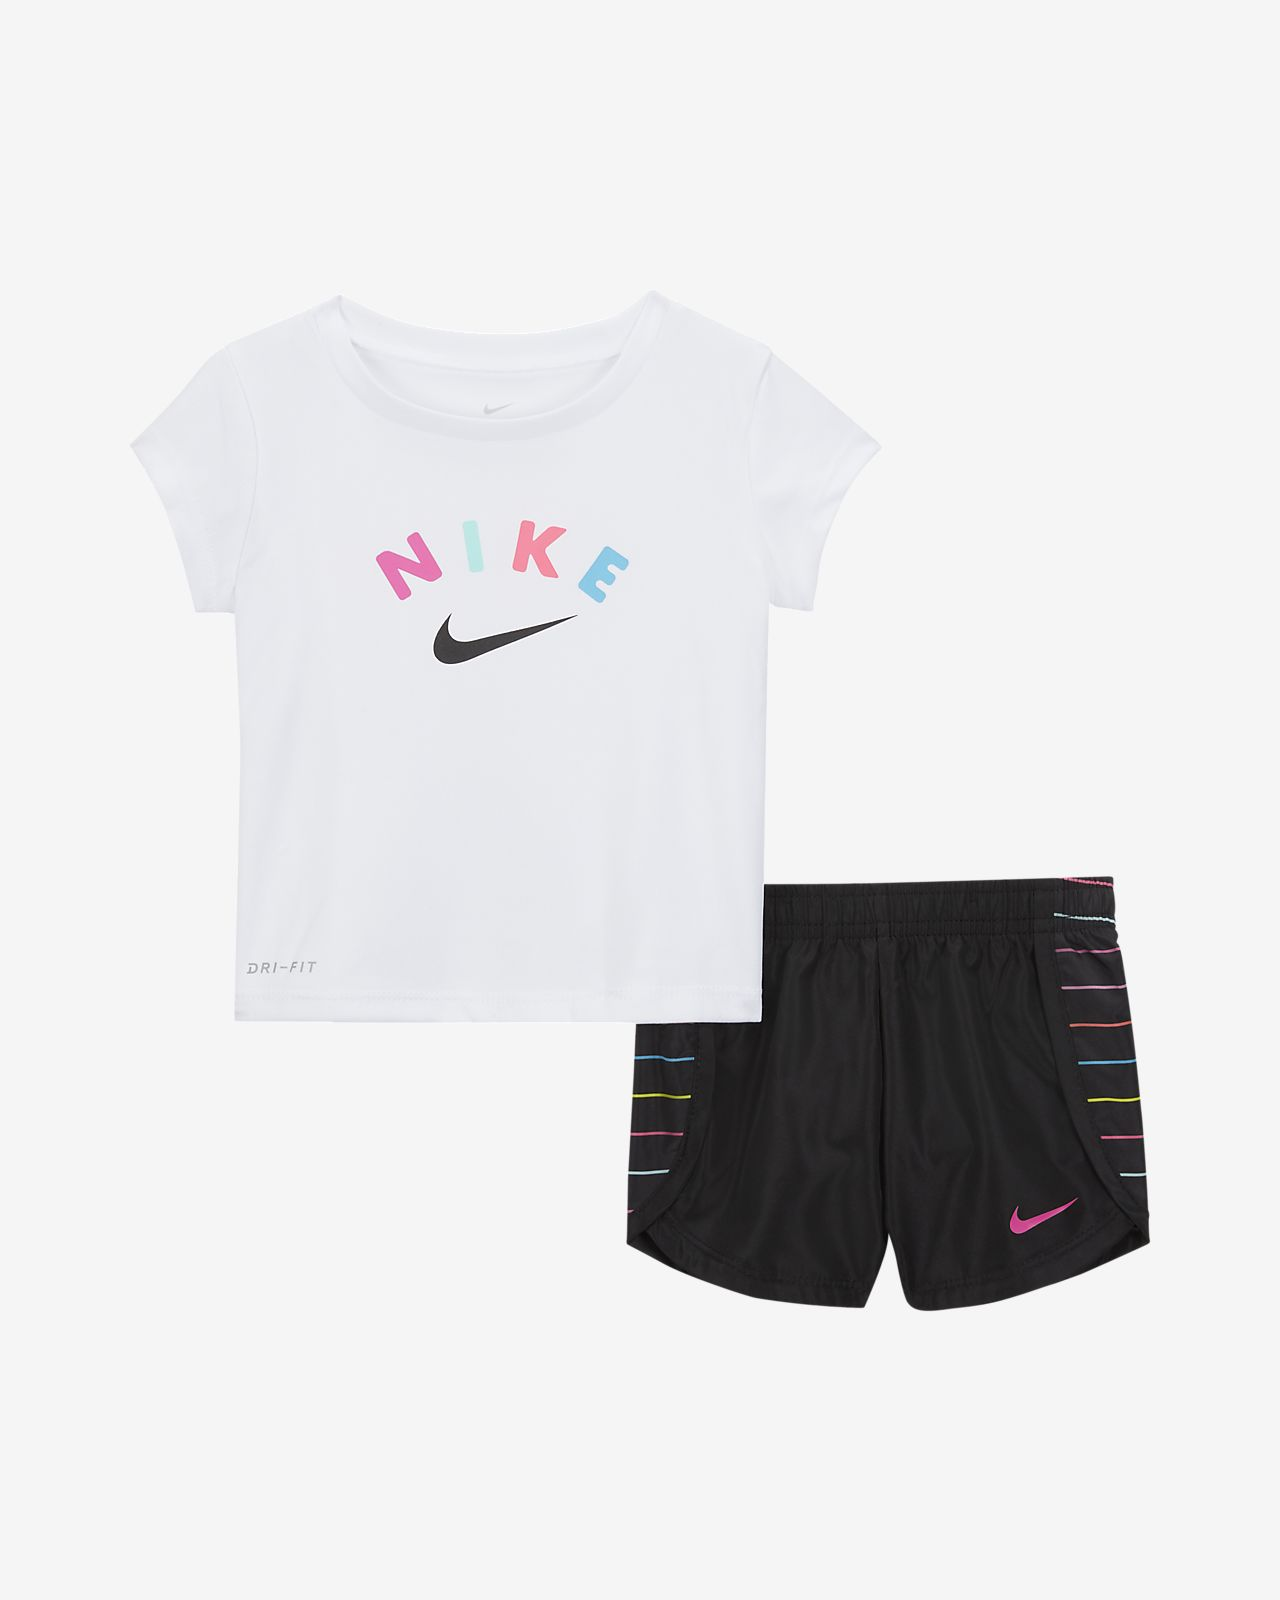 Conjunto de playera y shorts para bebé Nike Dri-FIT (12 a 24 meses)